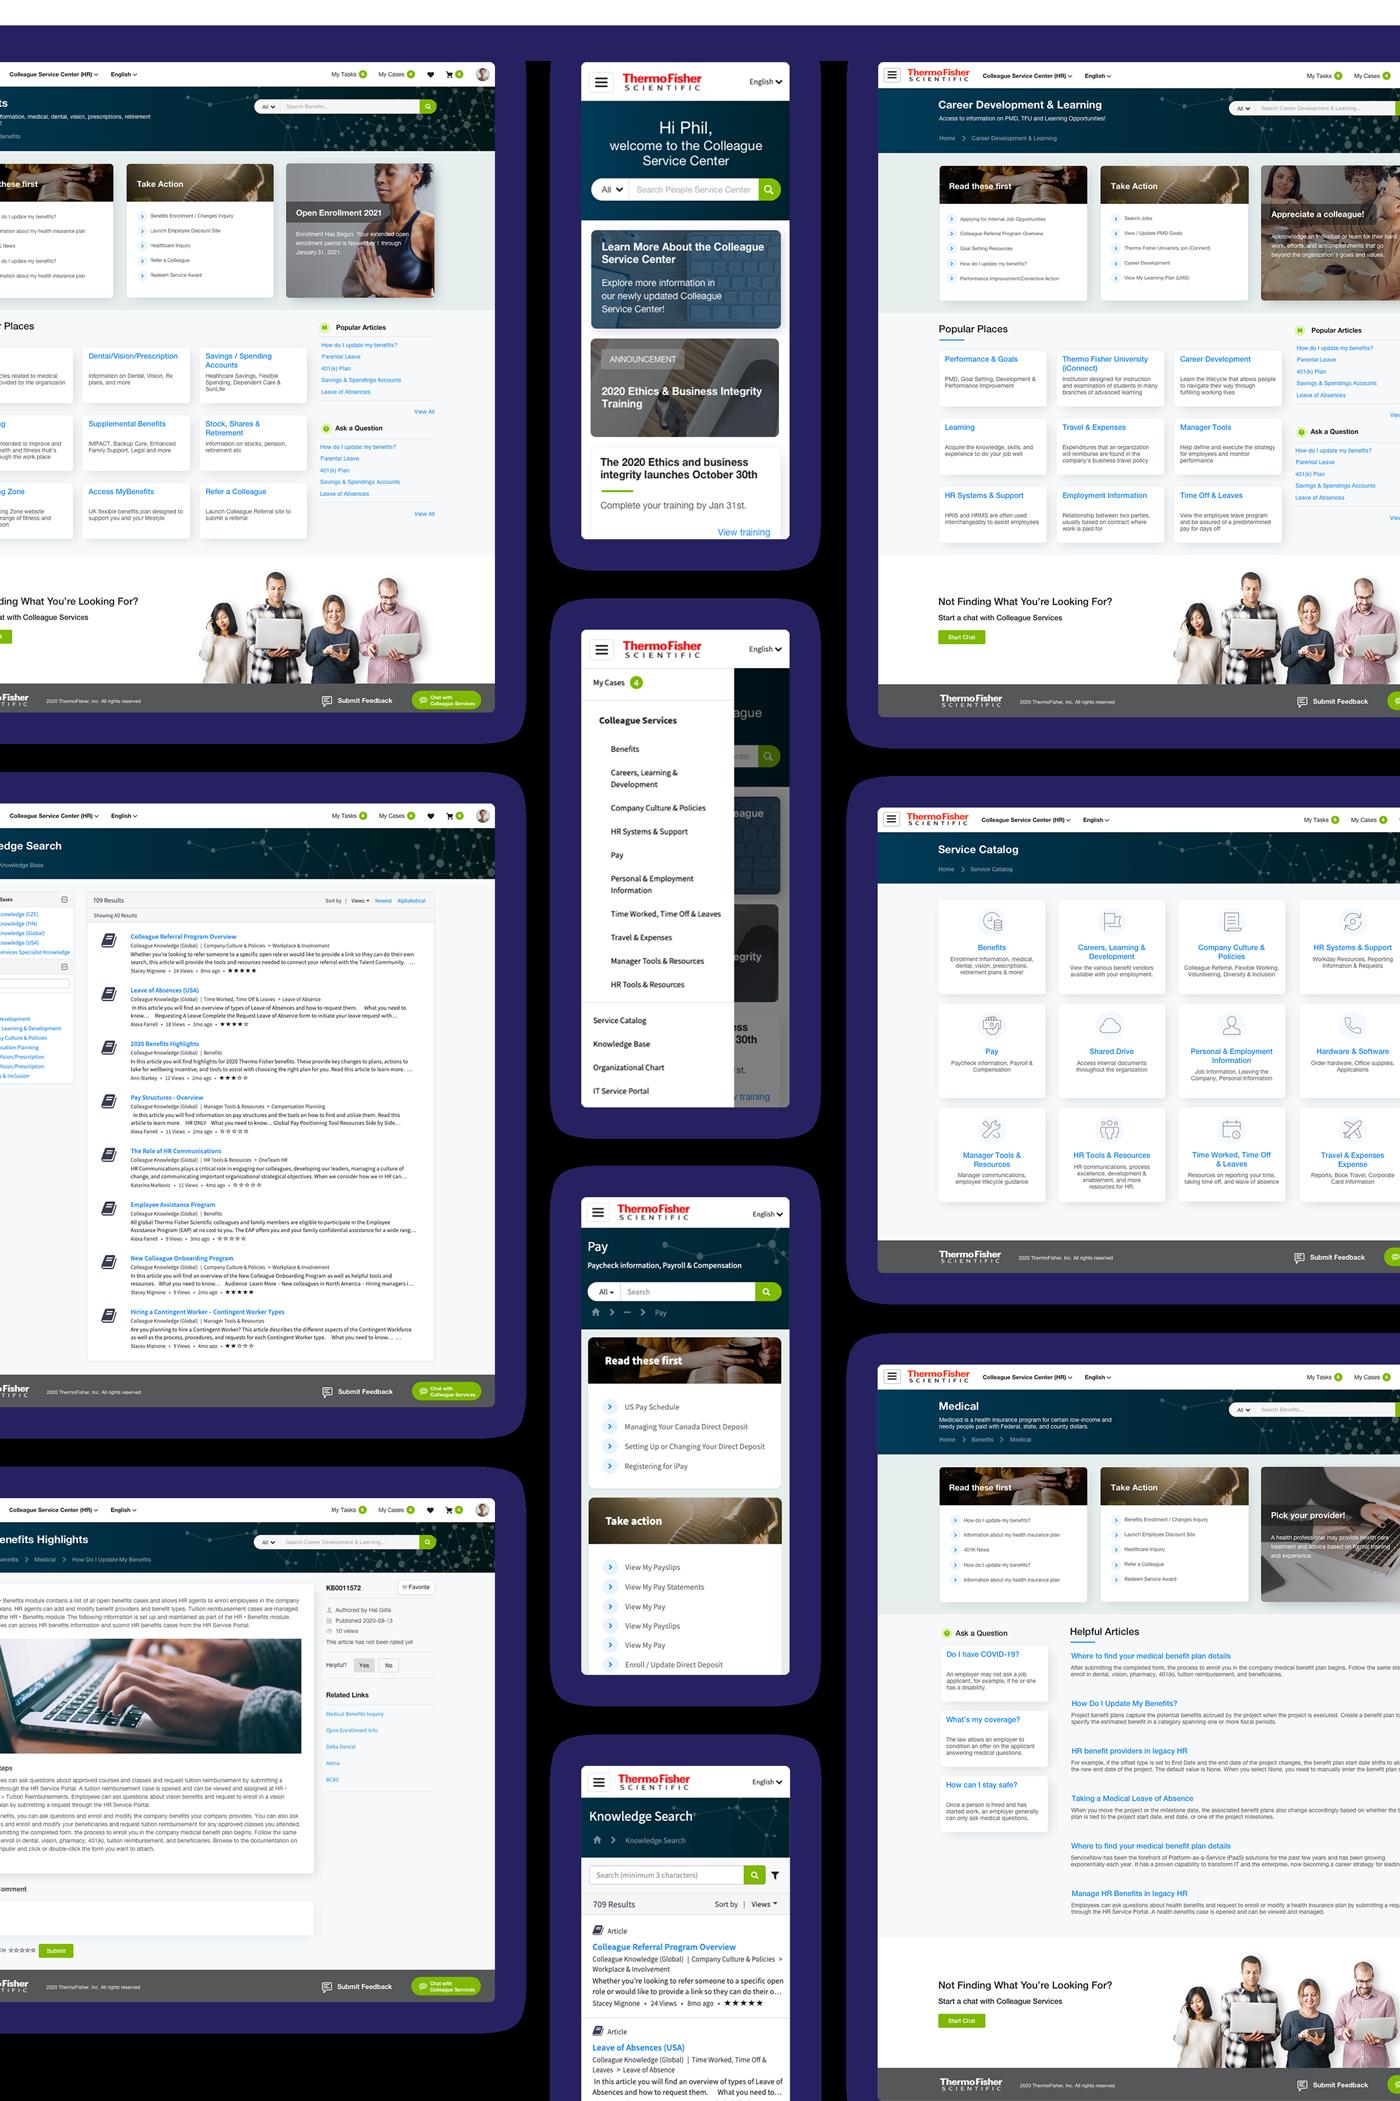 servicenow service portal